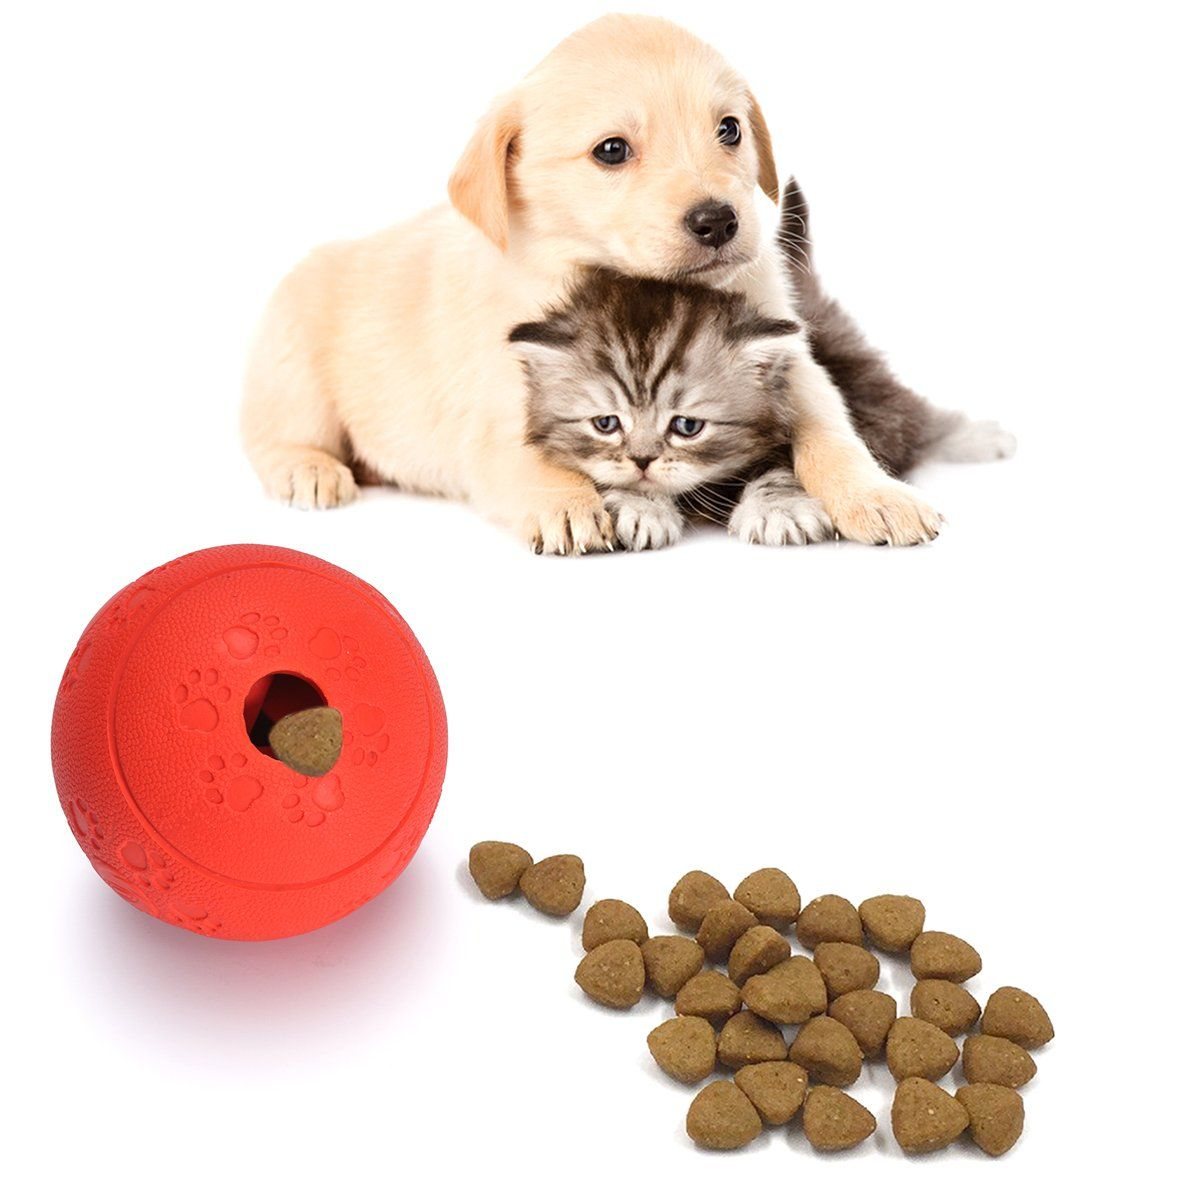 Dog Chew Toys Pestory Nontoxic Rubber Puzzle Dog Treat Slow Feed